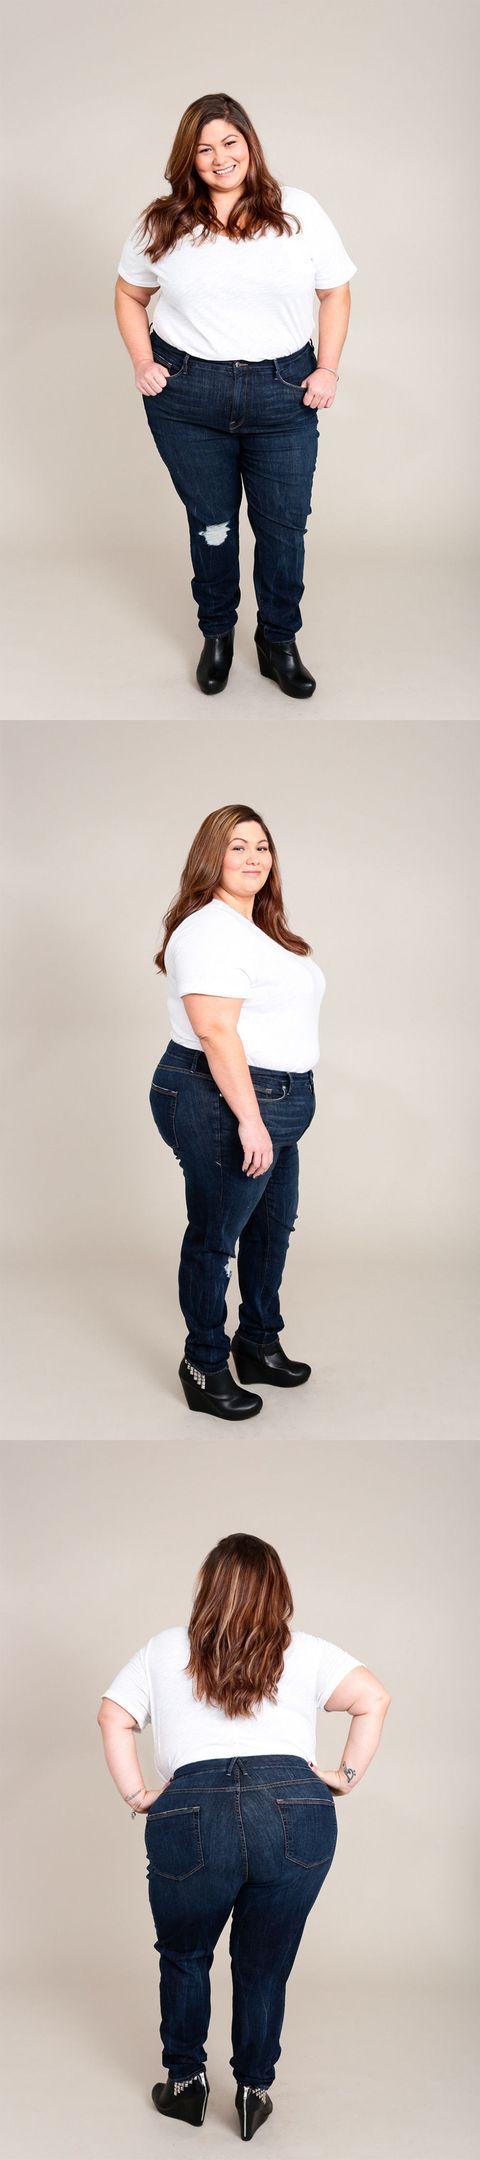 98d1c19a90 Khloe Kardashian Good American Jeans Review - Real Women Try Khloe ...